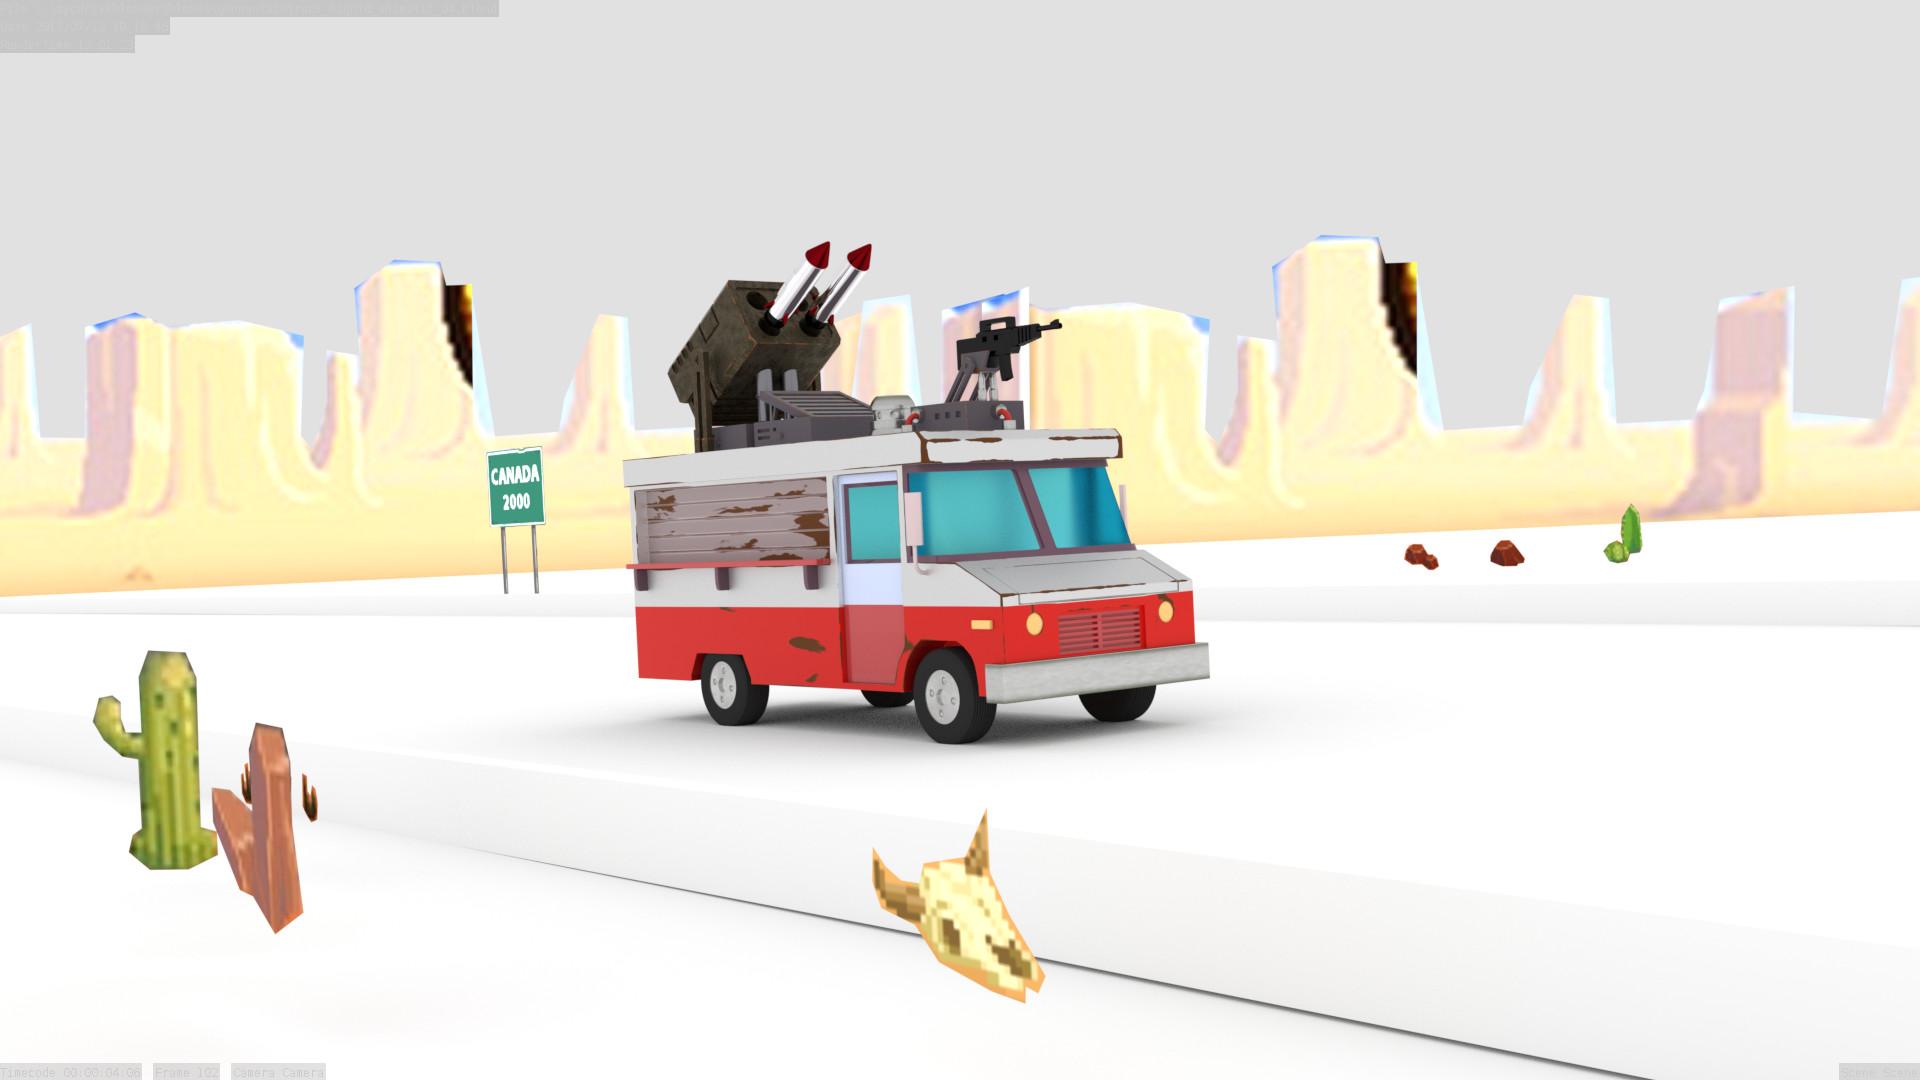 Jason o toole gunmantacotruck night6 animatic 04 002